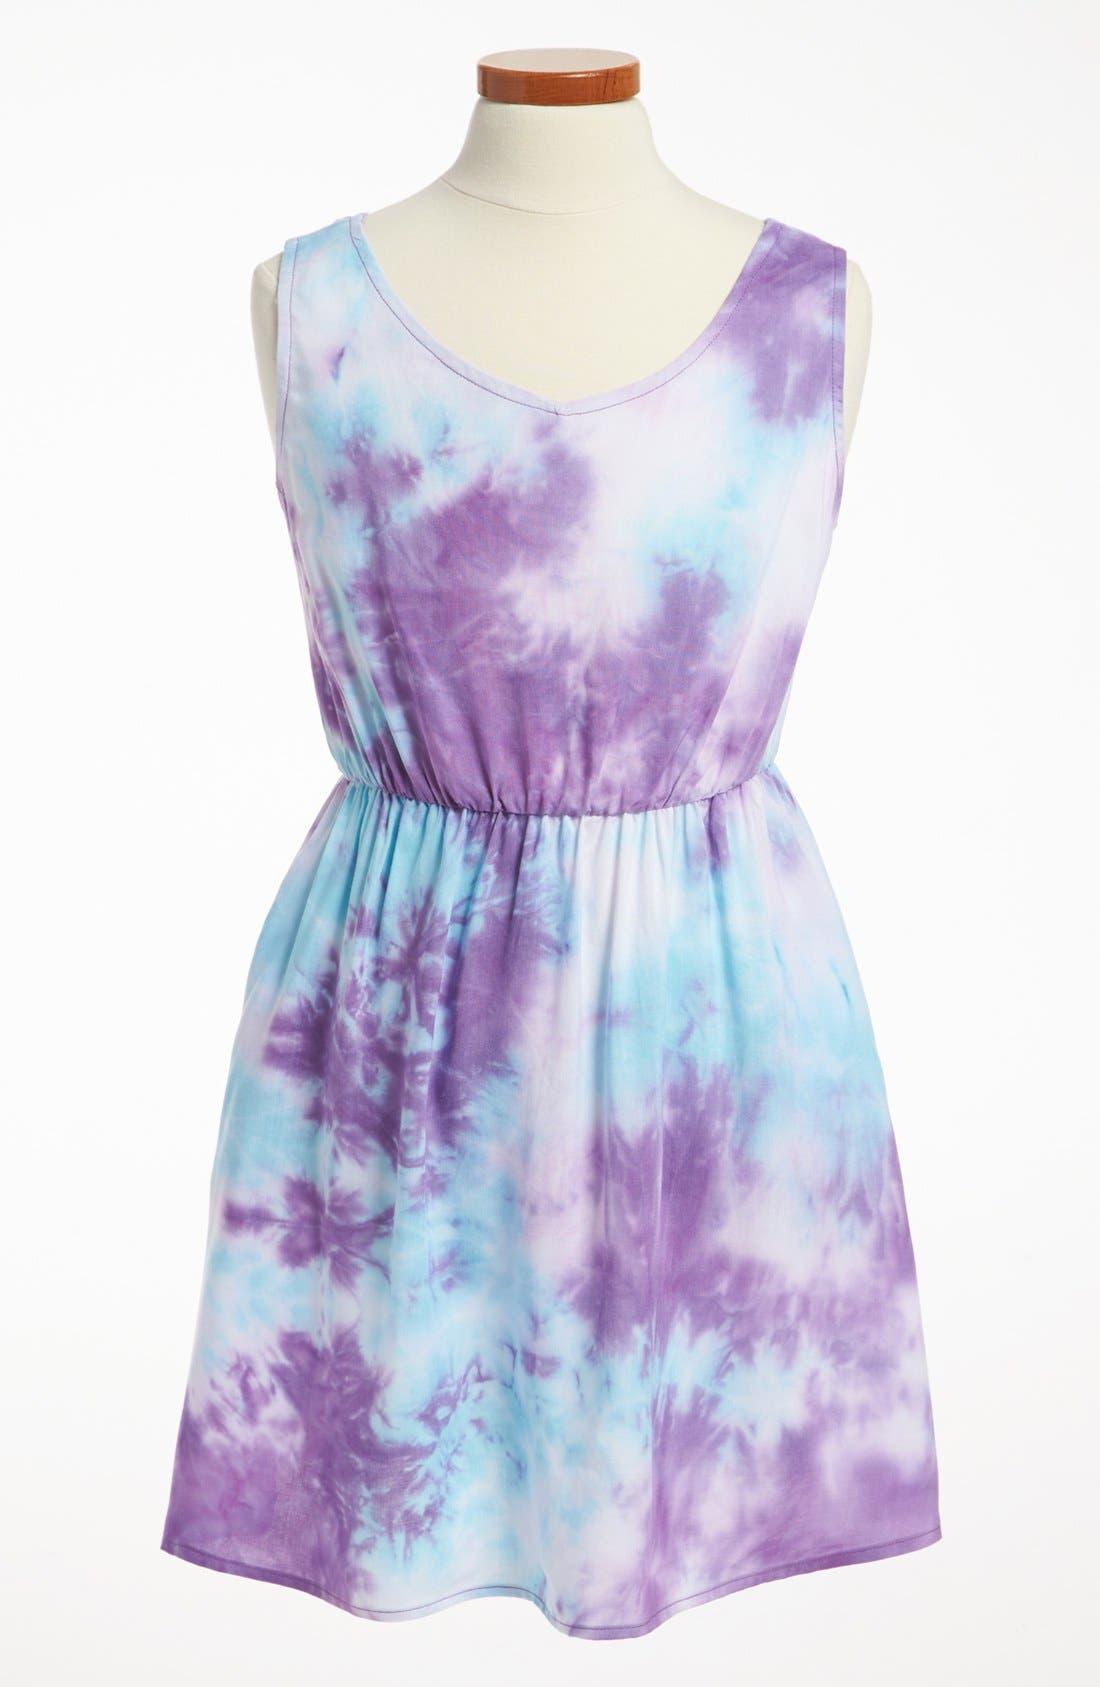 Main Image - Mia Chica Two Tone Dress (Big Girls)